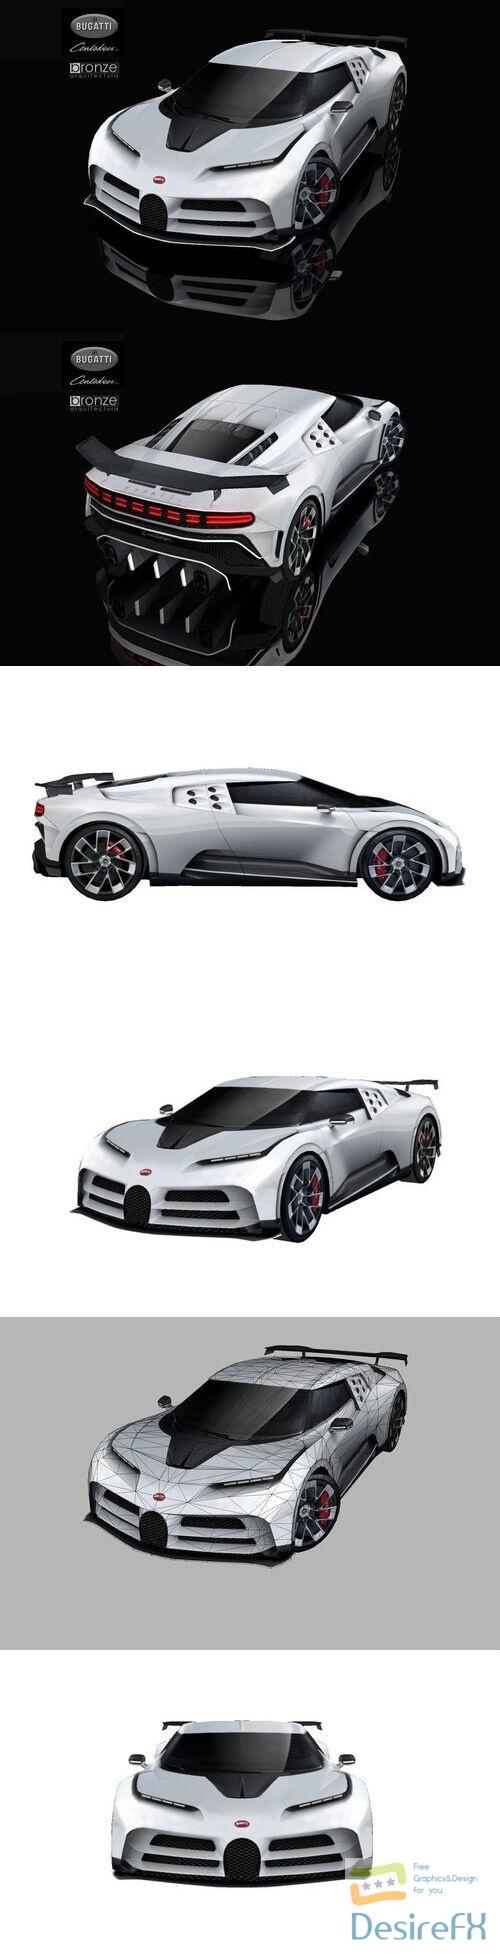 Bugatti Centodieci 2020 Low-poly 3D Model